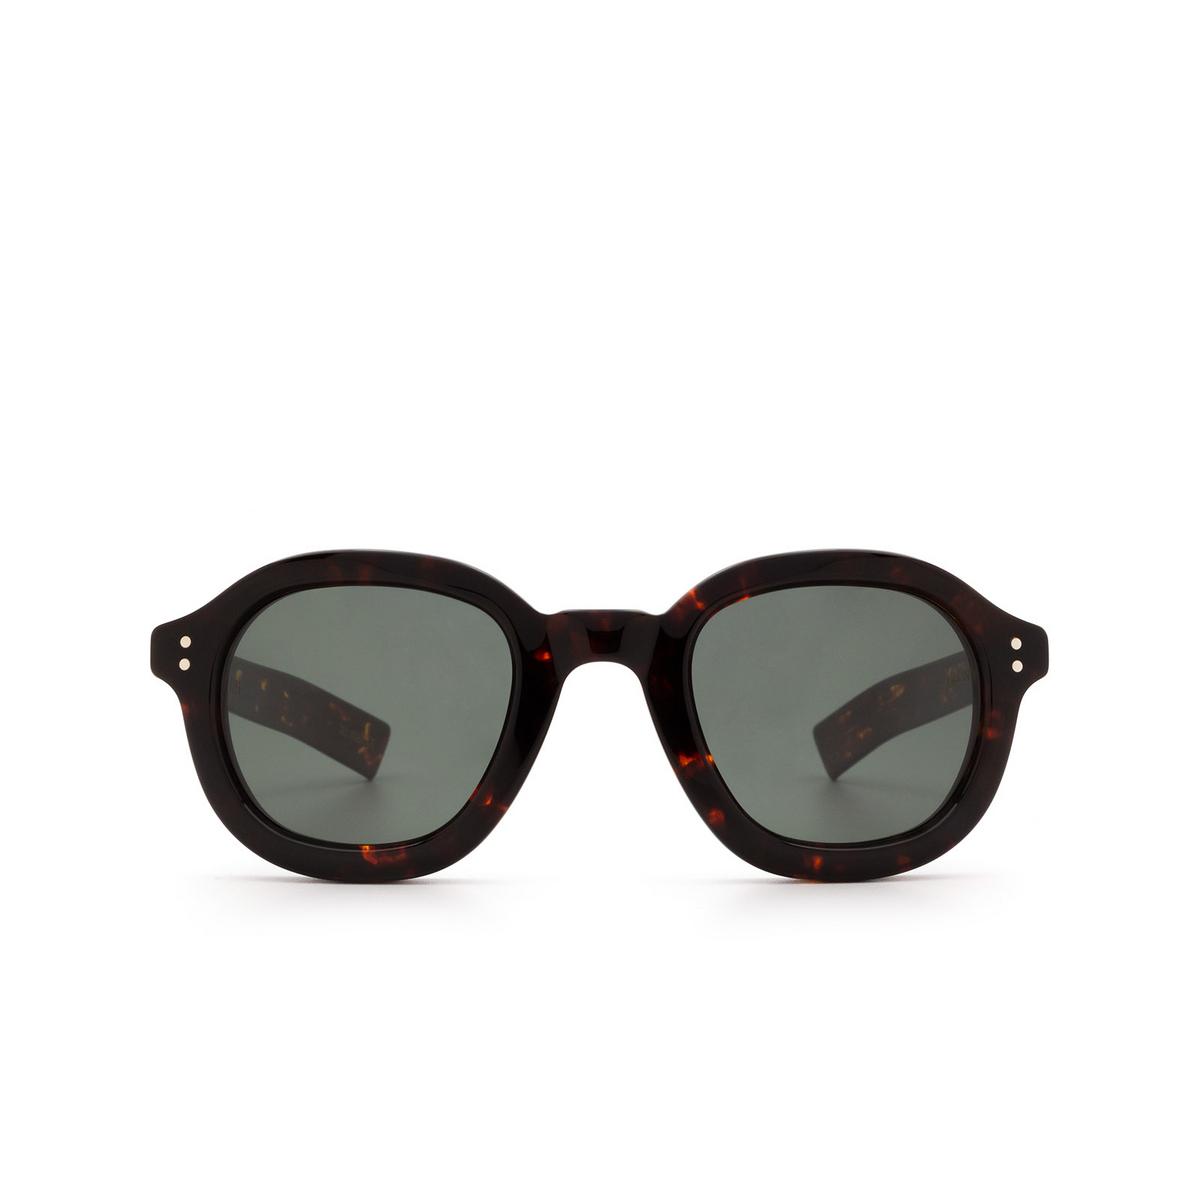 Lesca® Square Sunglasses: Largo color Dark Tortoise 424 - front view.